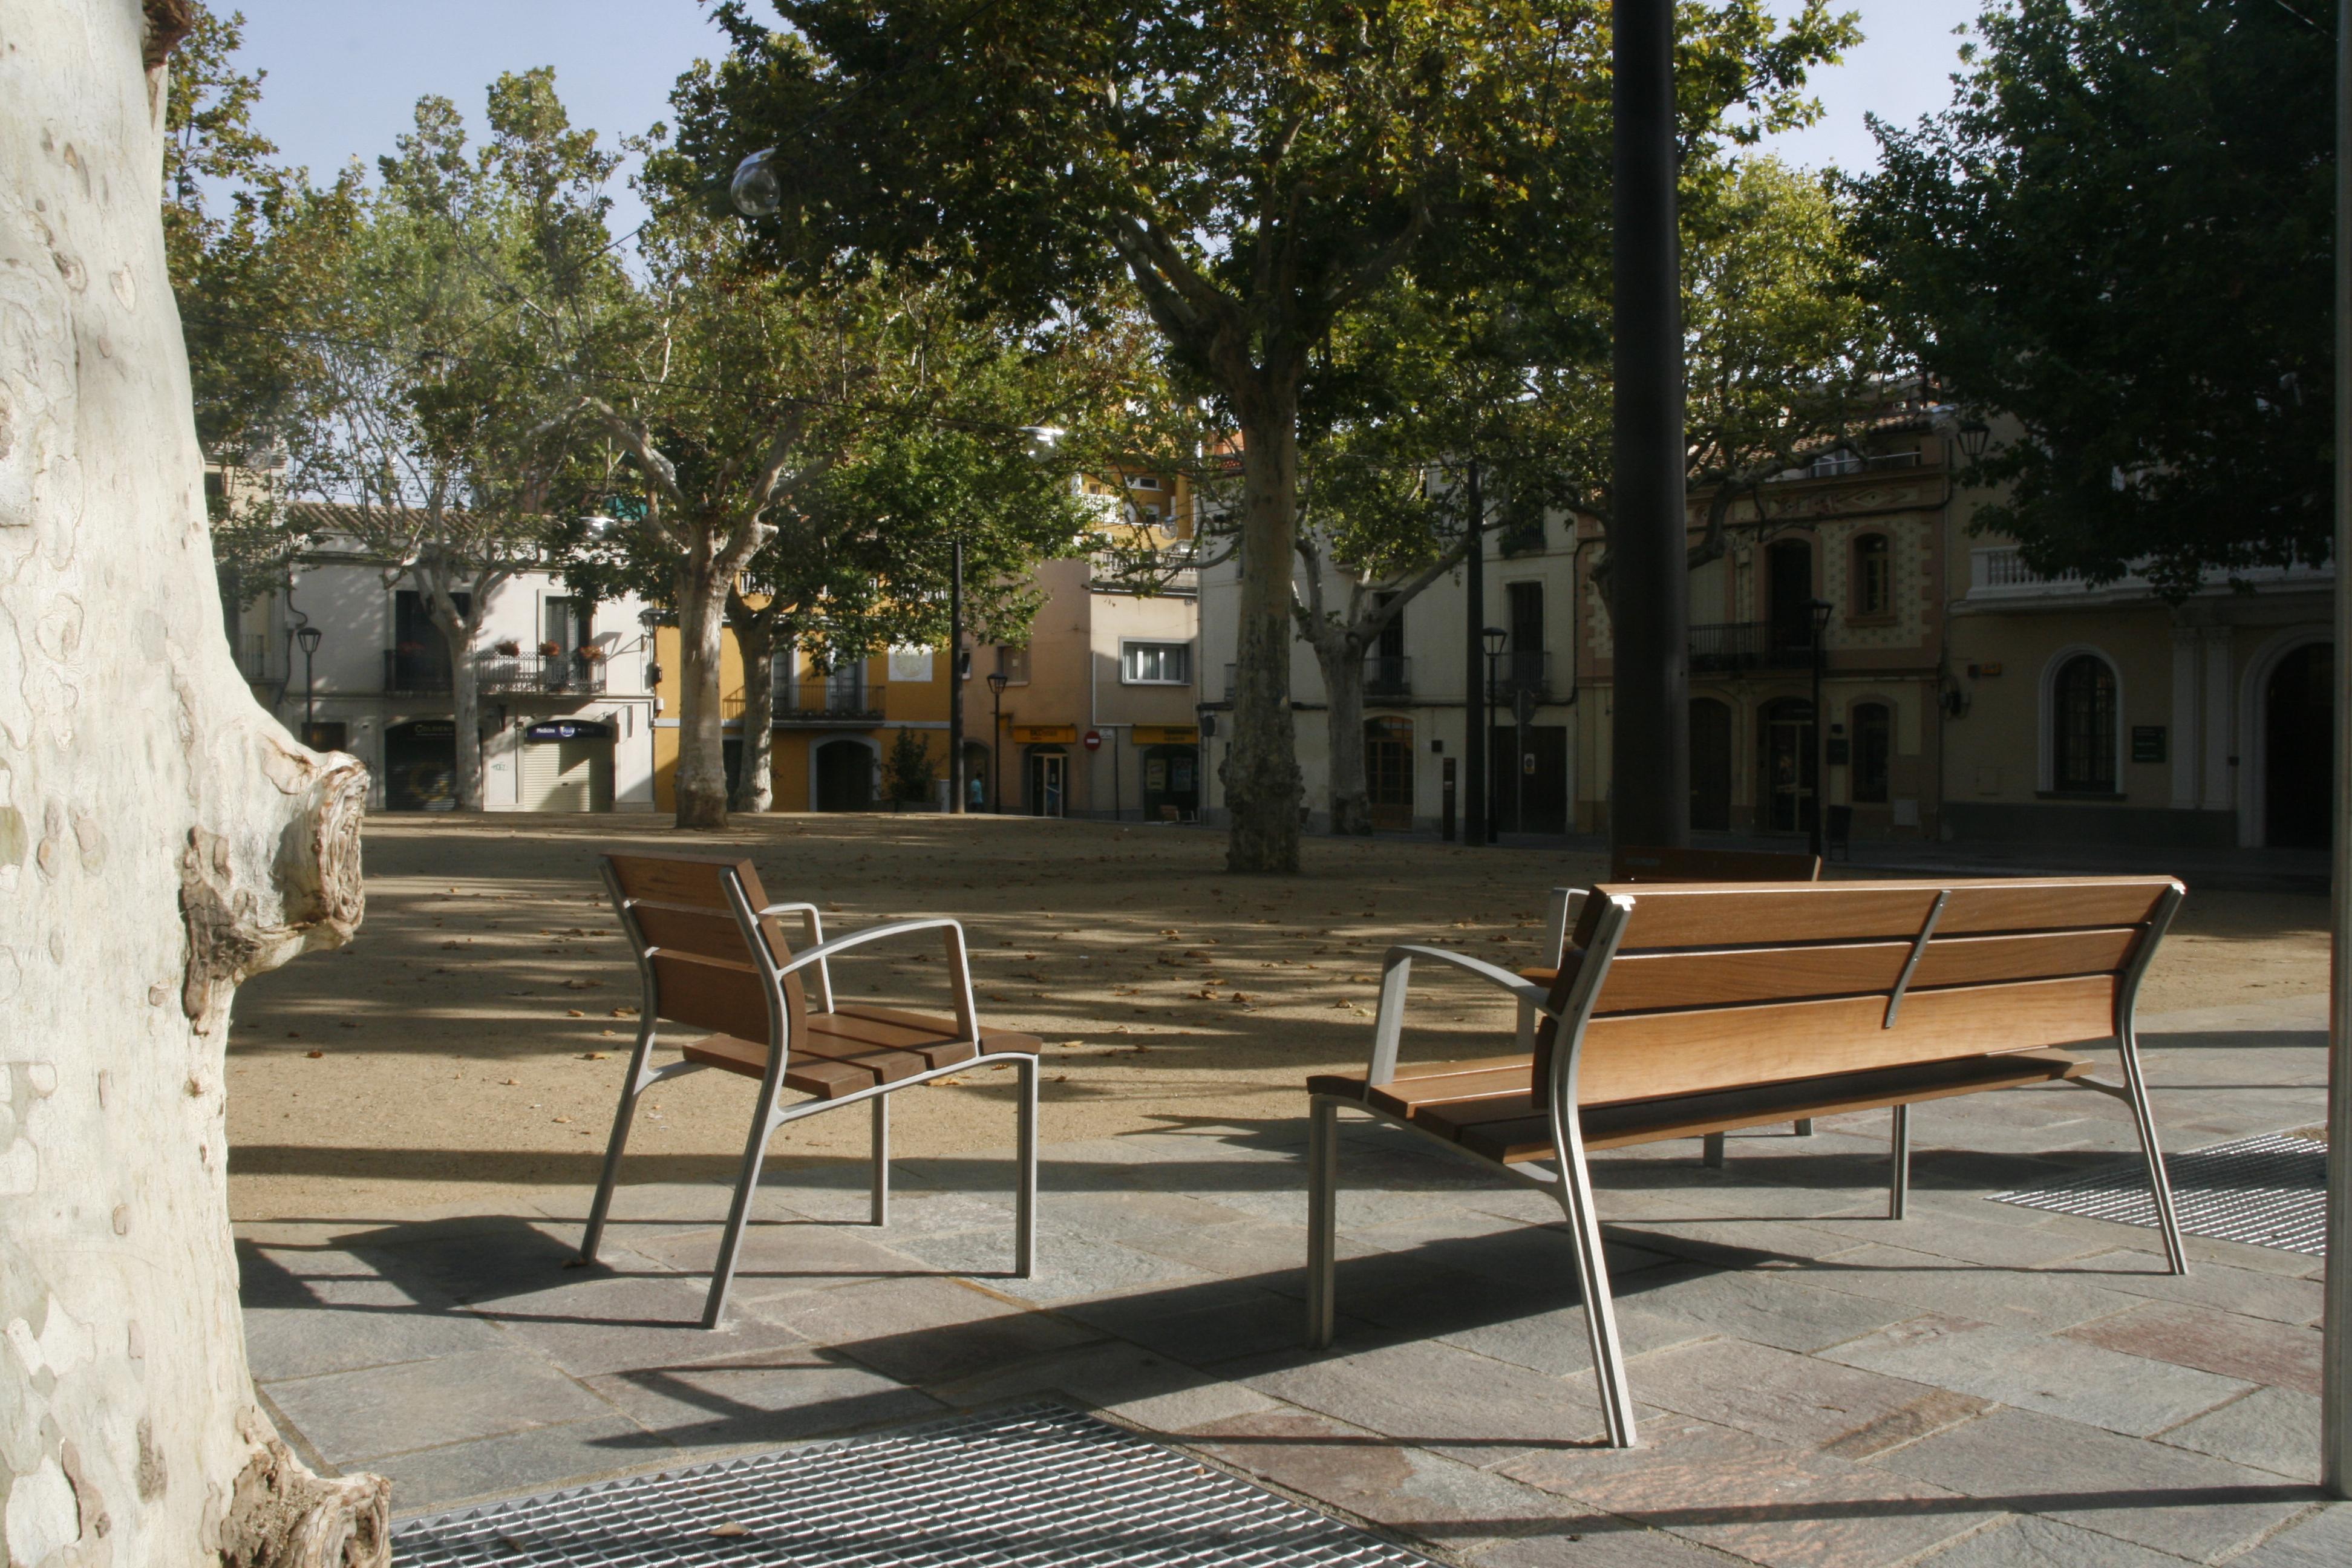 Inauguraci de la pla a barcelona a sant cugat duran - Placa barcelona sant cugat ...